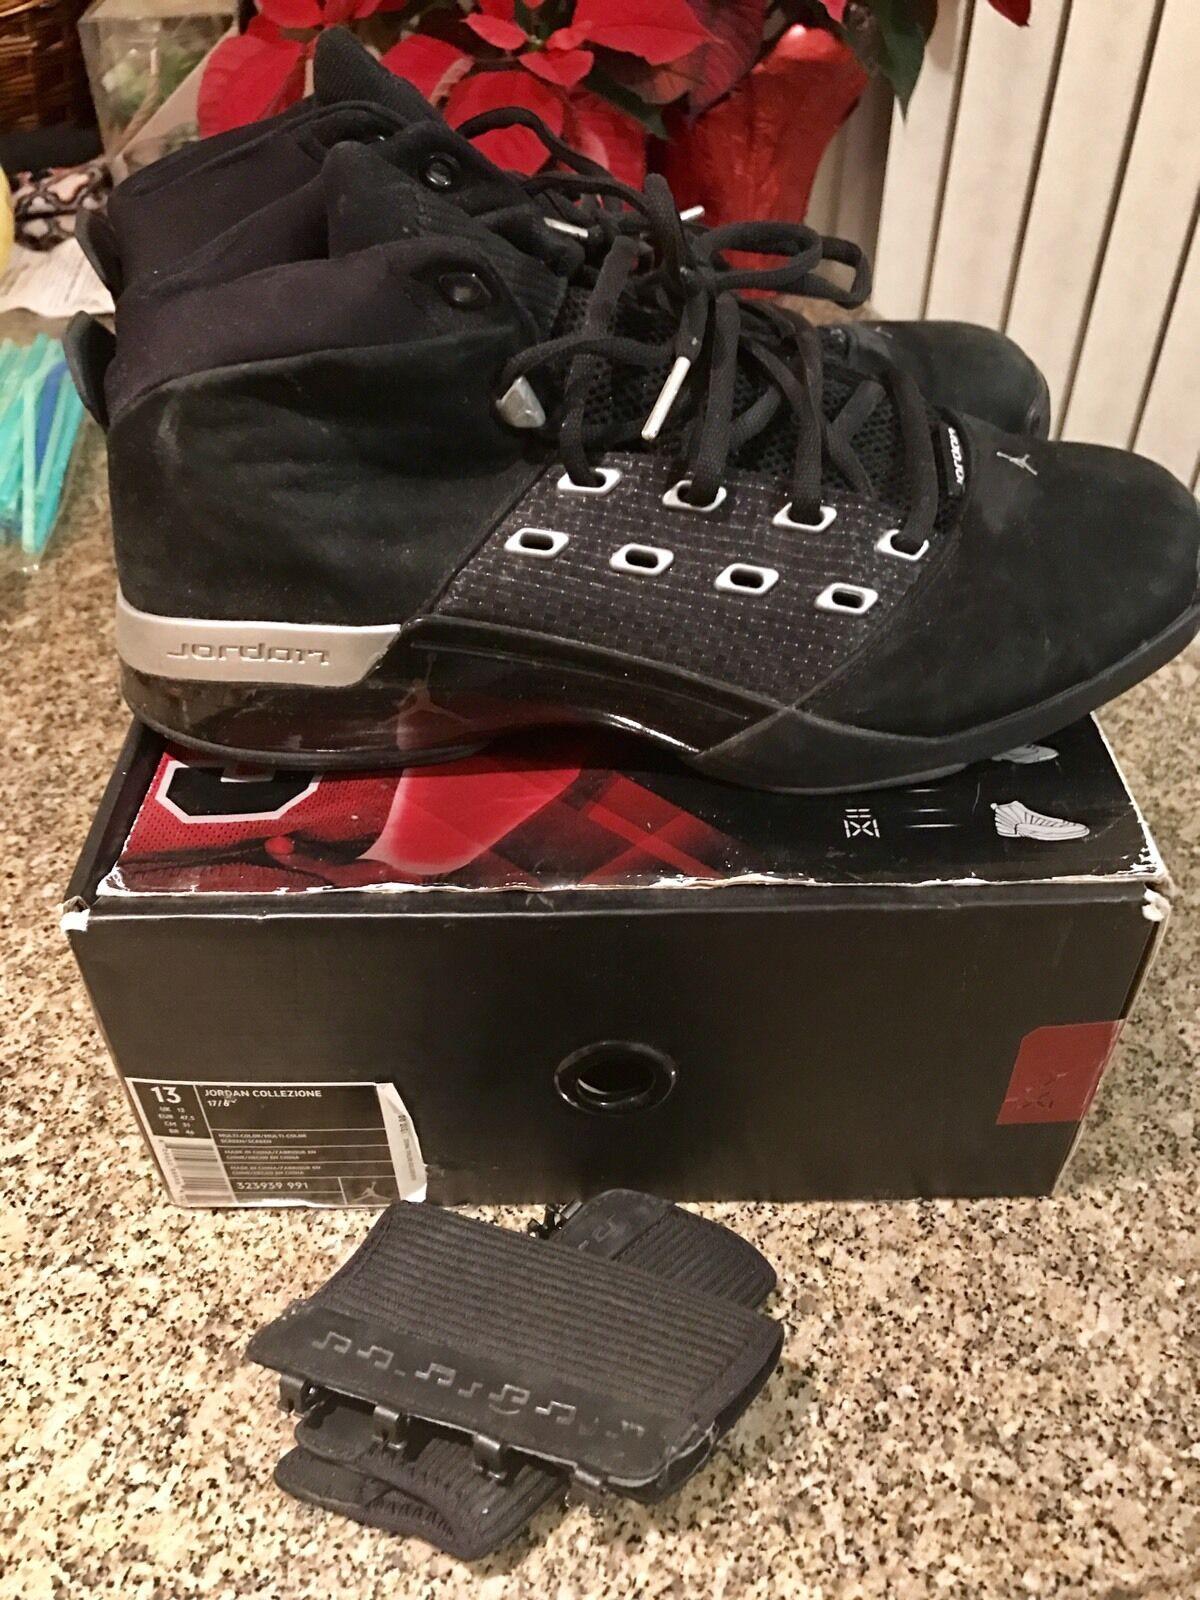 brand new 52aad ed44e 2008 Air Jordan Jordan Jordan 17 Retro CDP 17 6 Countdown Pack 323939-991  Größe 13 dd7795